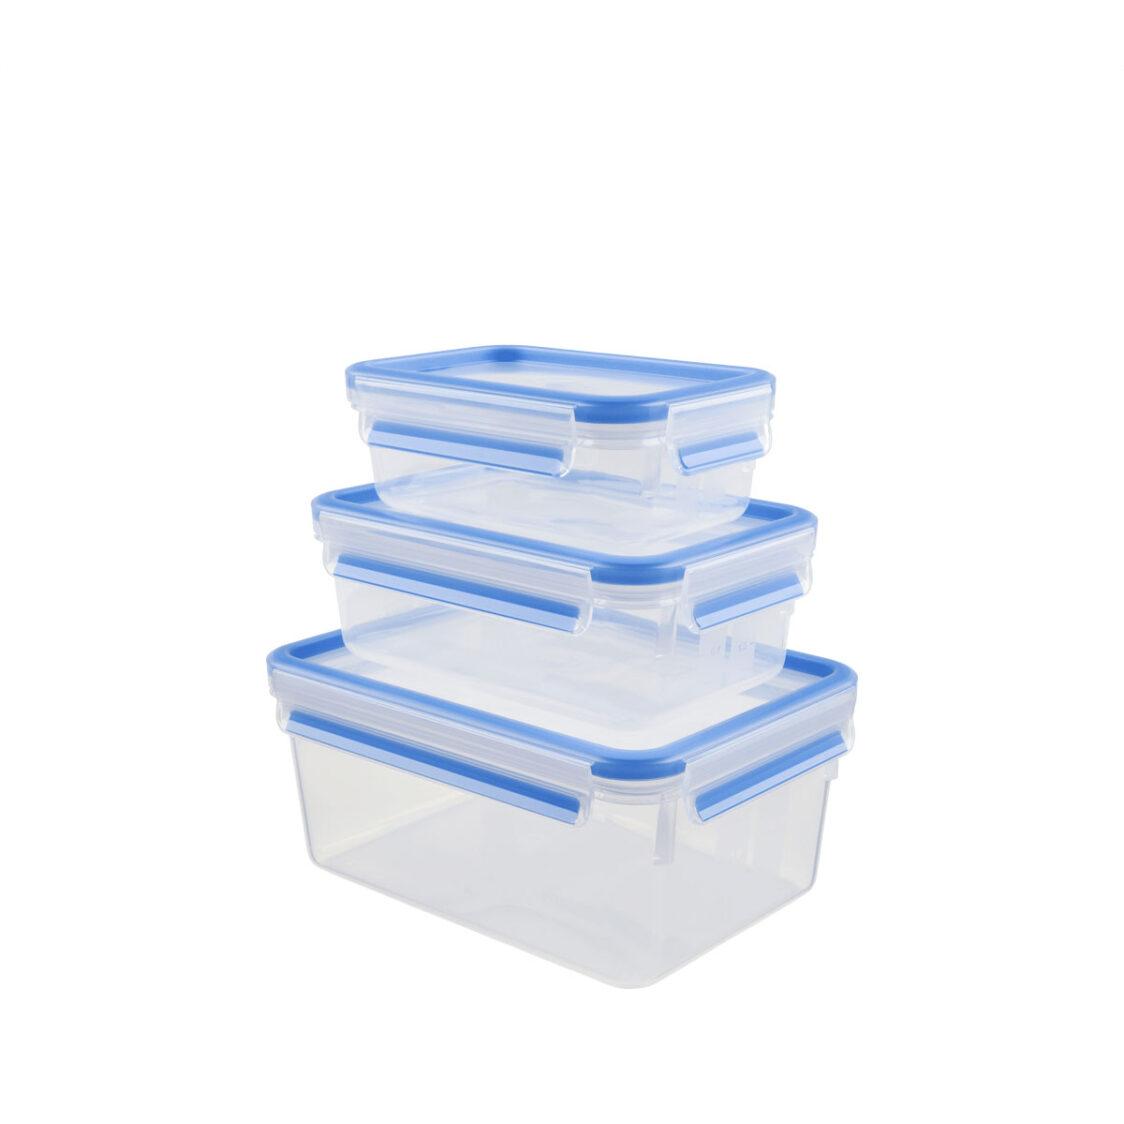 Tefal Masterseal Fresh Box 3pcs Set